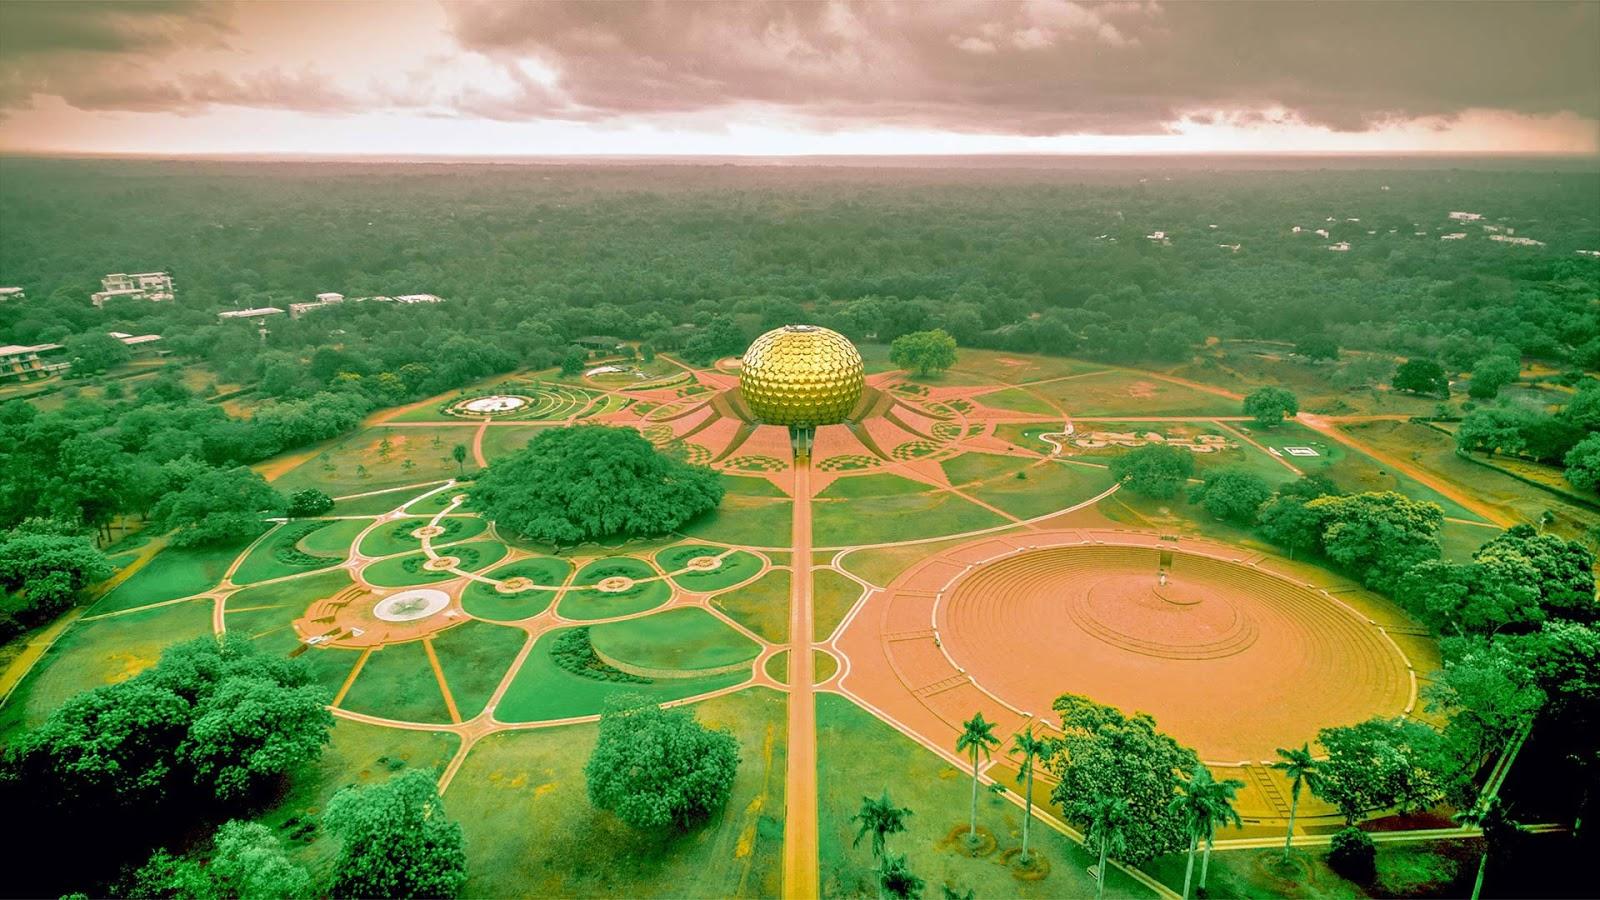 Auroville, India © Vikram Ramakrishnan/Shutterstock